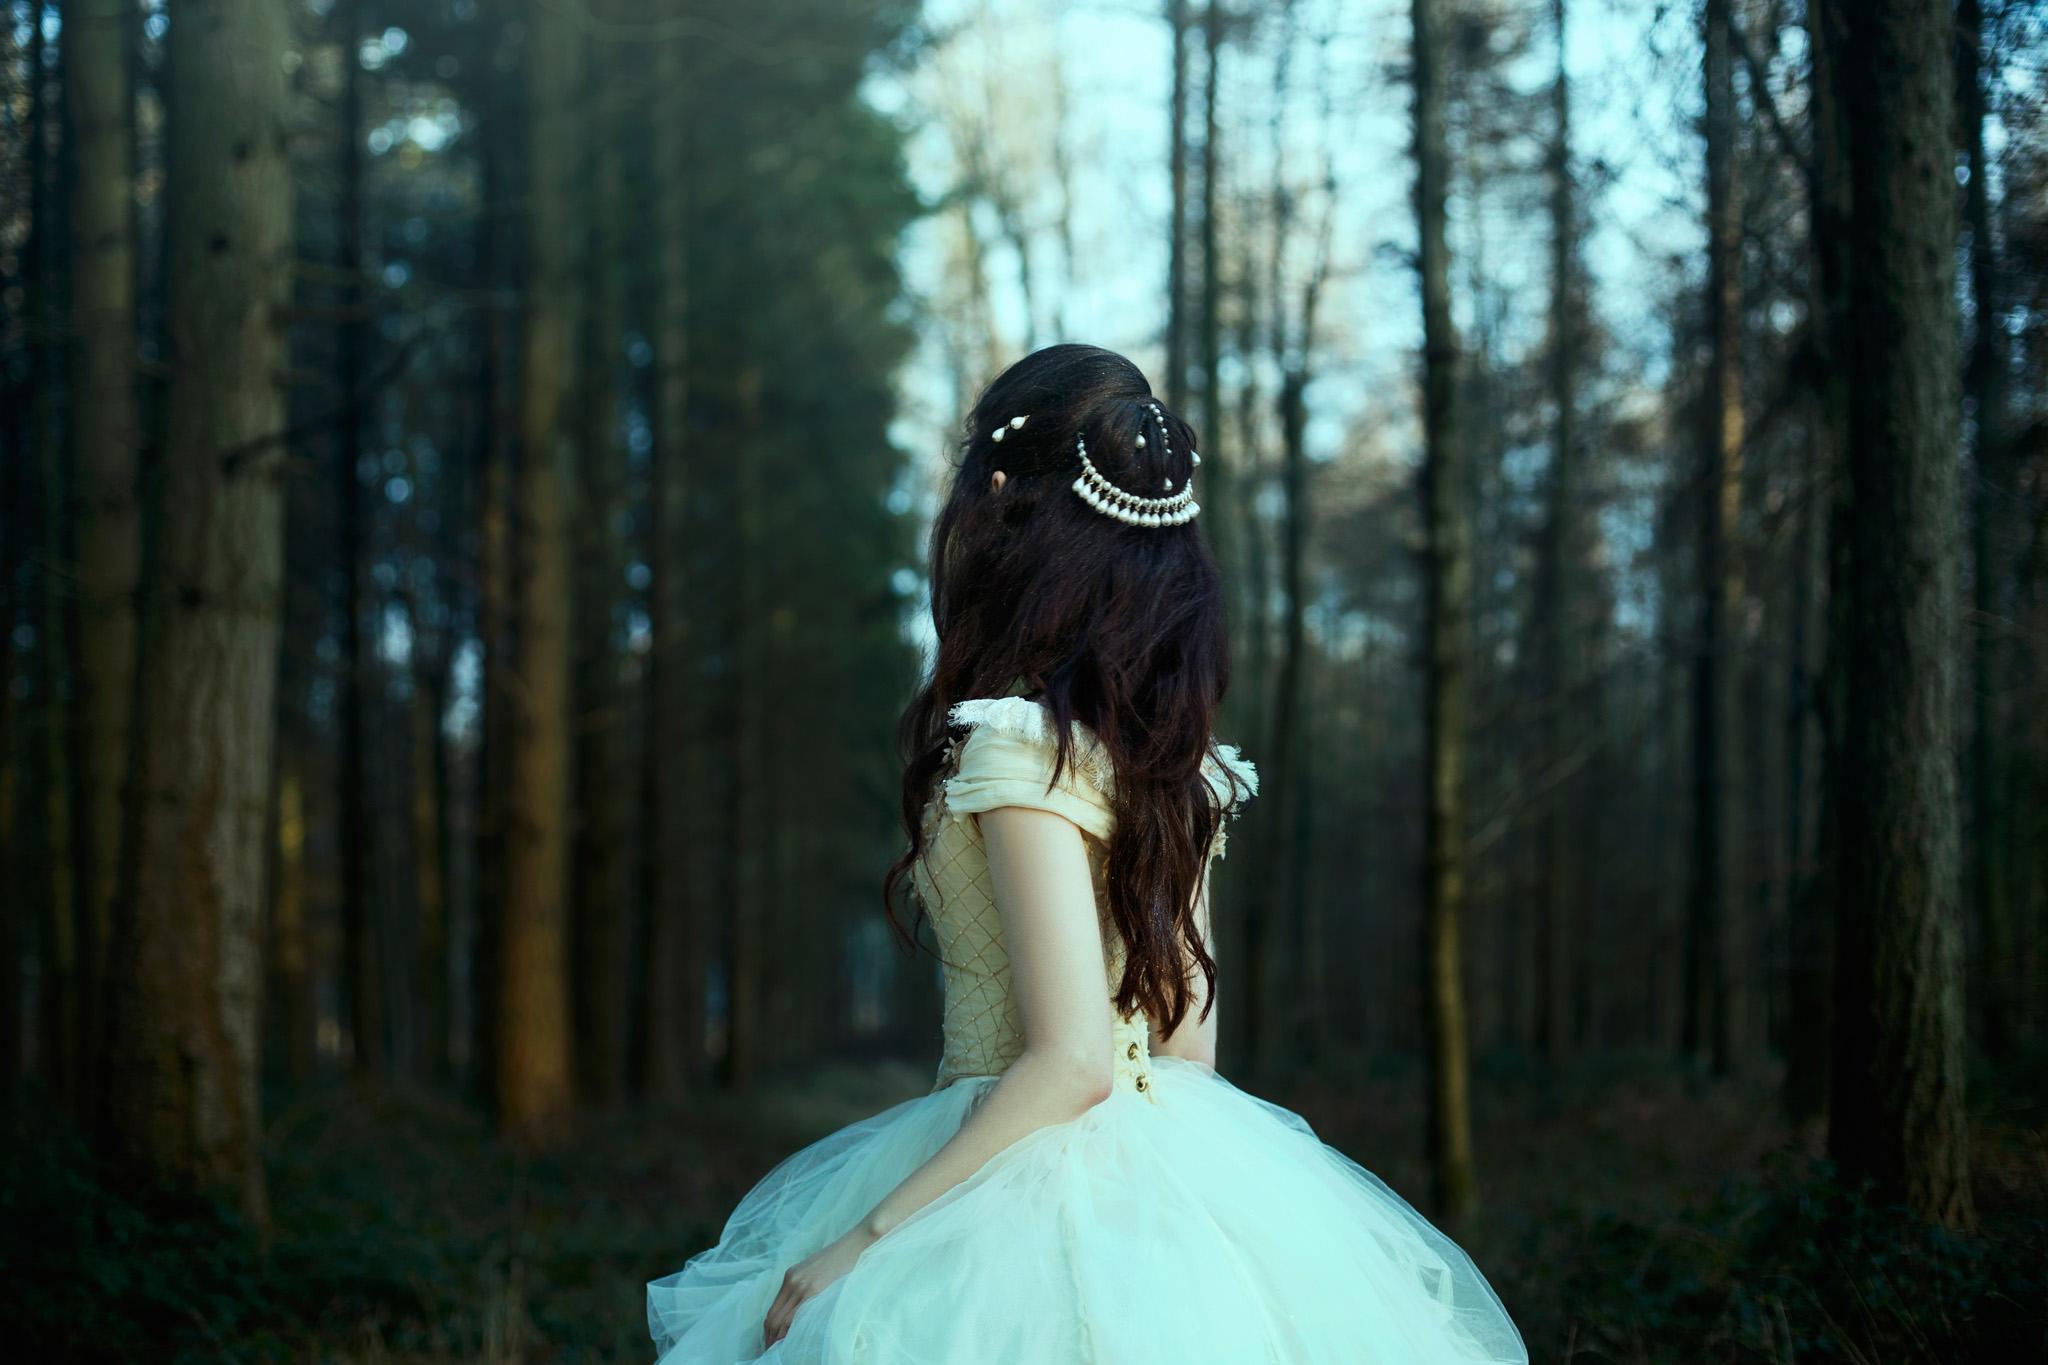 bella-kotak-fairytale-fairytales-labyrinth-david-bowie-sarah-beauty-beast-magic-magical-faerie-magazine-editorial-firefly-path-twilight-woods-lantern-ethereal-fairy-disney-ian-hencher-1s.jpg